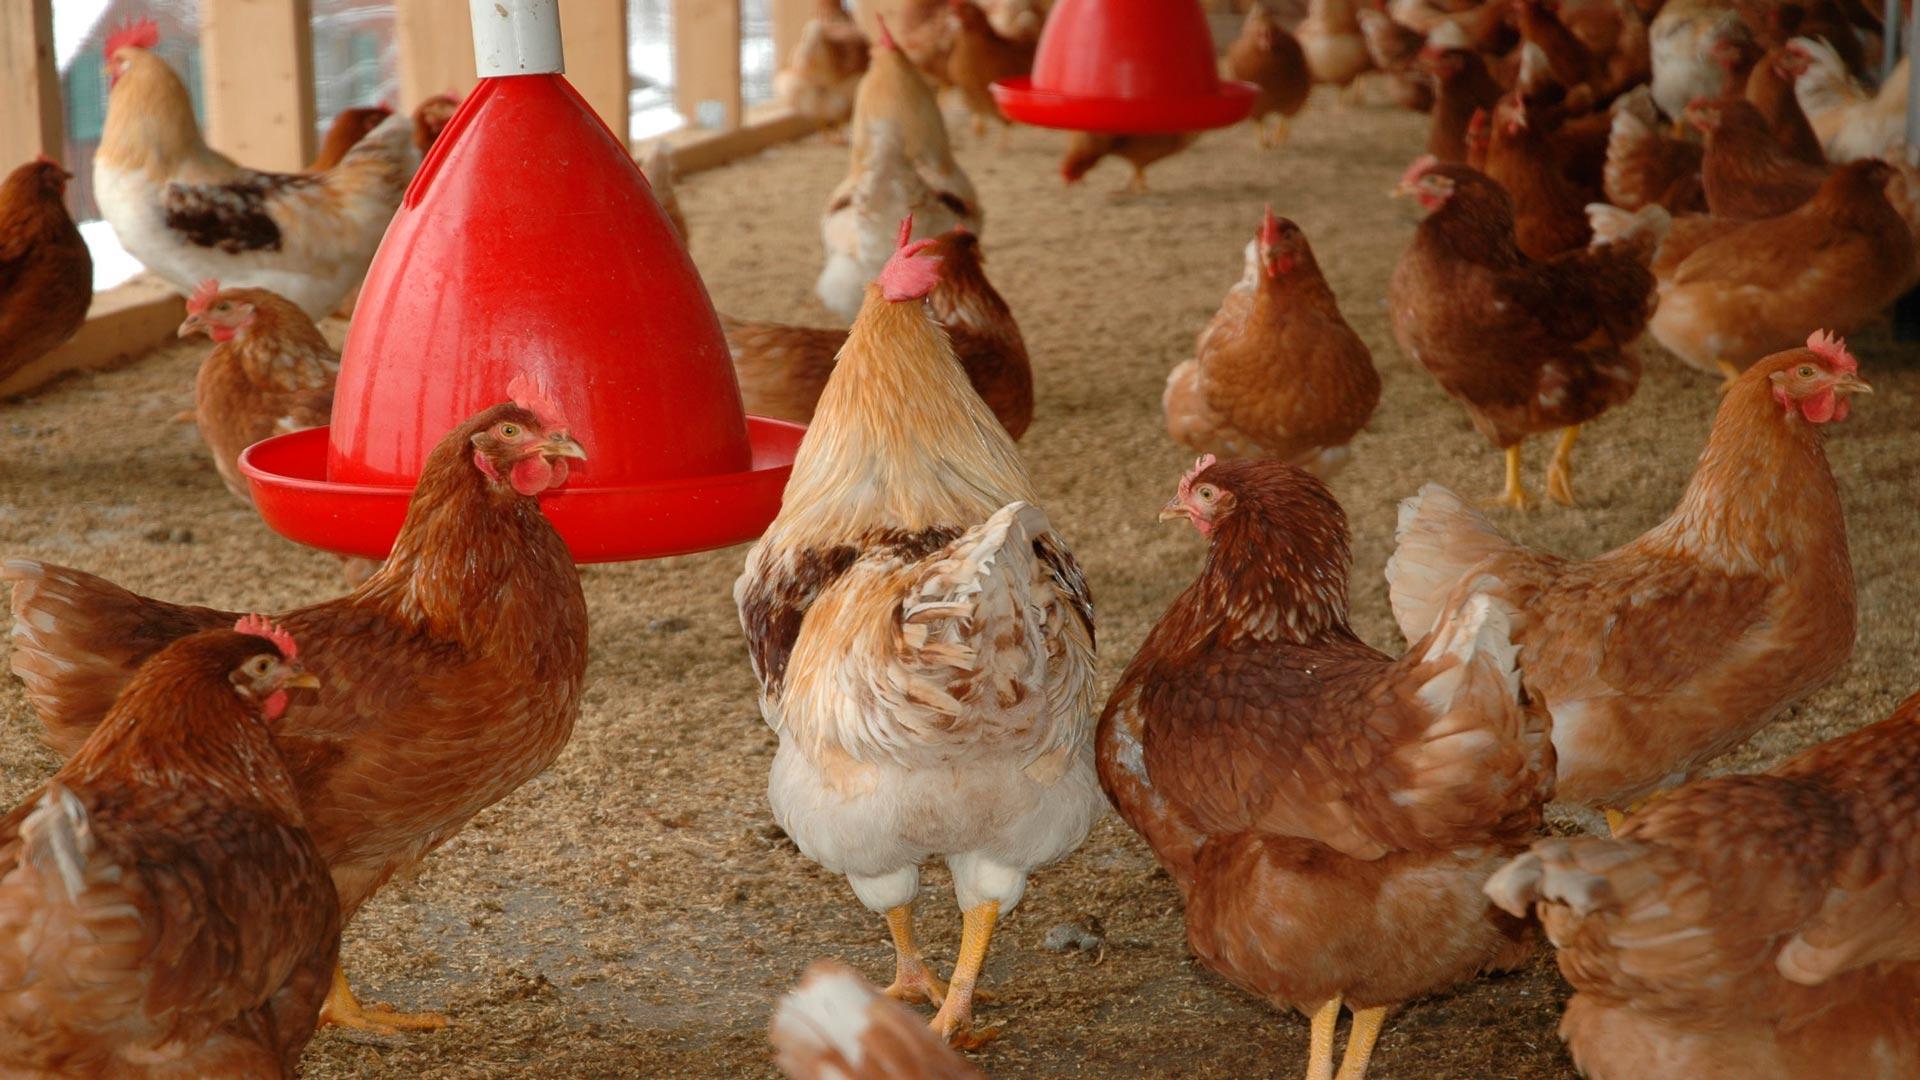 Quiero tener mi propio gallinero